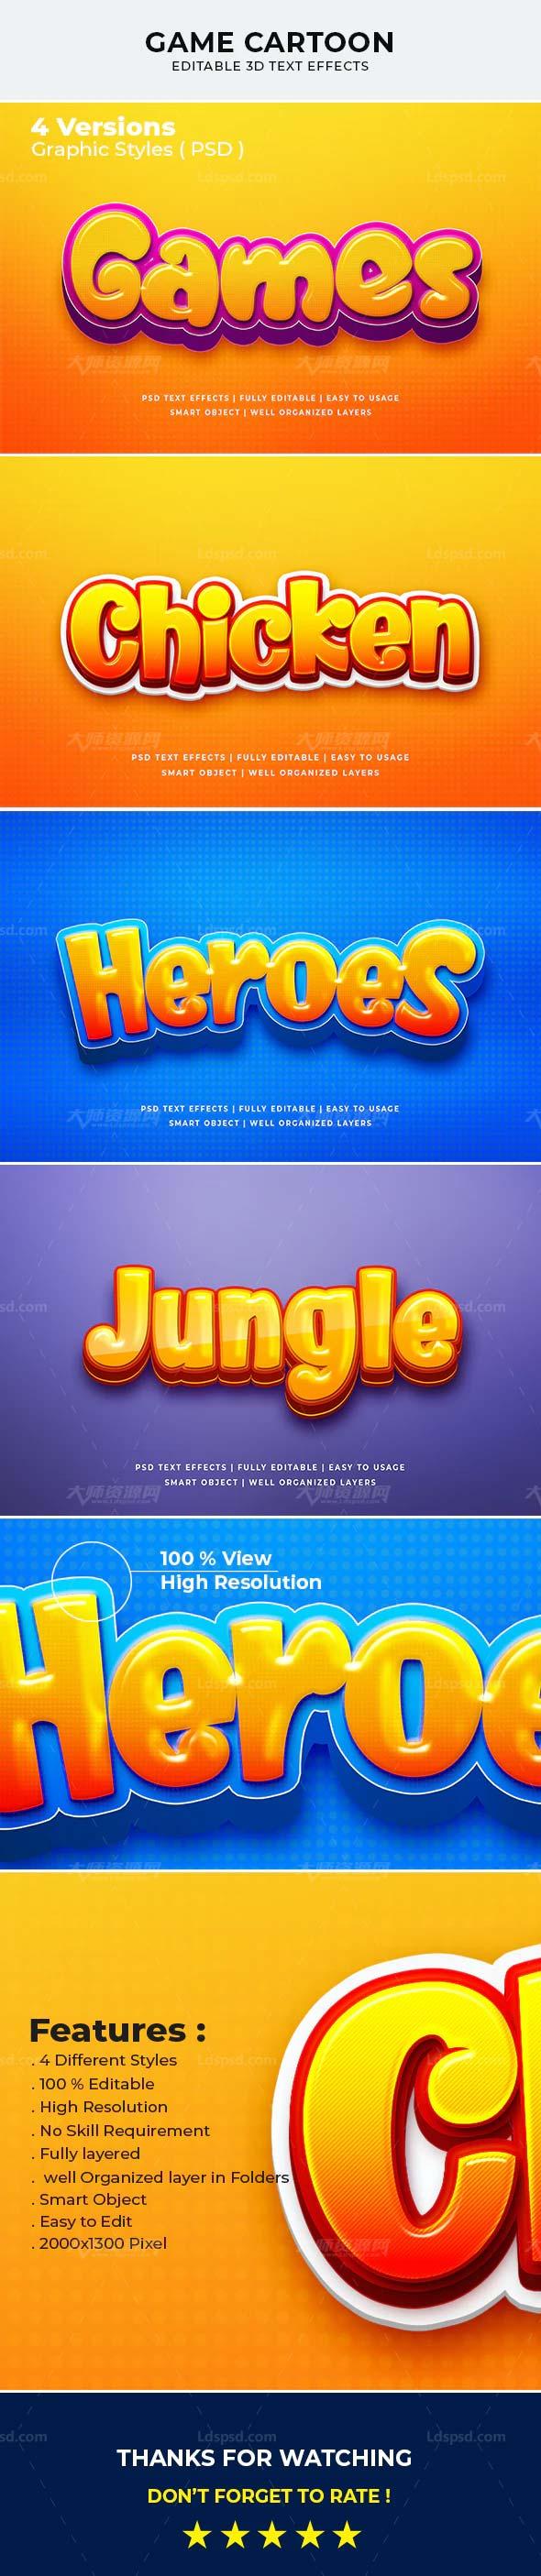 Game Cartoon 3d Text Effect Mockup.jpg